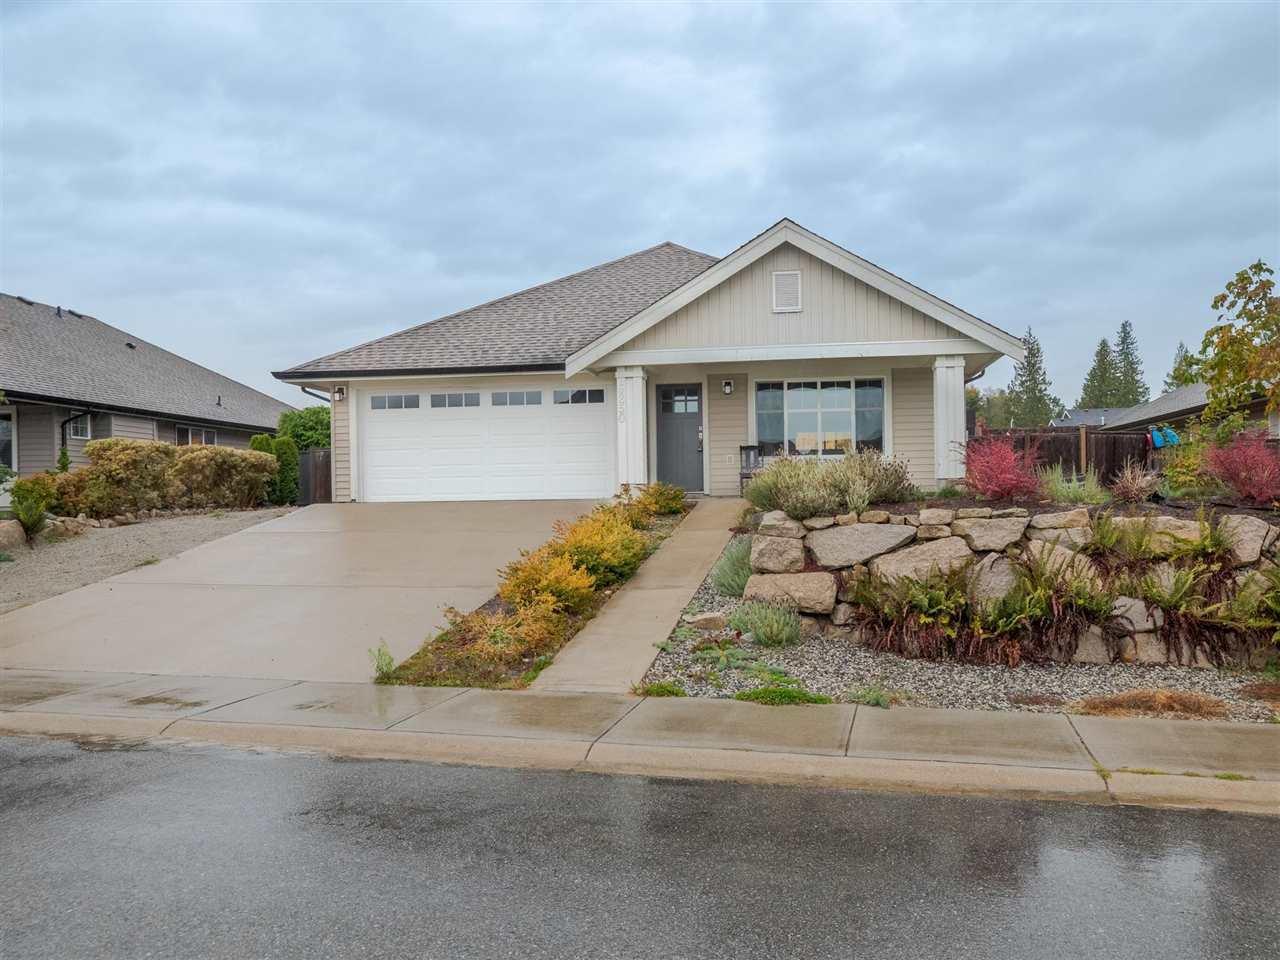 Main Photo: 6250 KEVINS Road in Sechelt: Sechelt District House for sale (Sunshine Coast)  : MLS®# R2413408